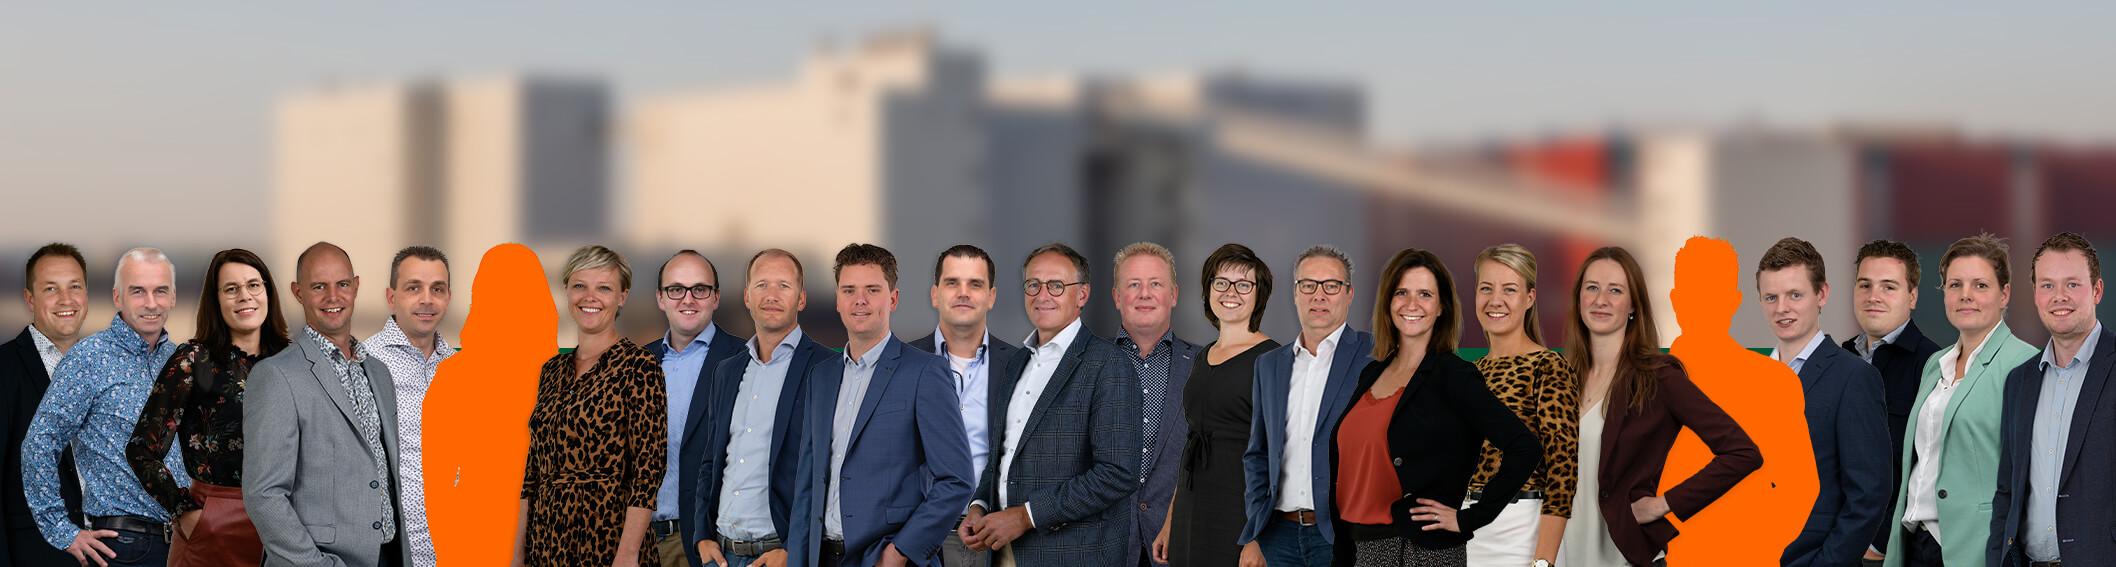 VanWestreenen_Hele-team_Vacature